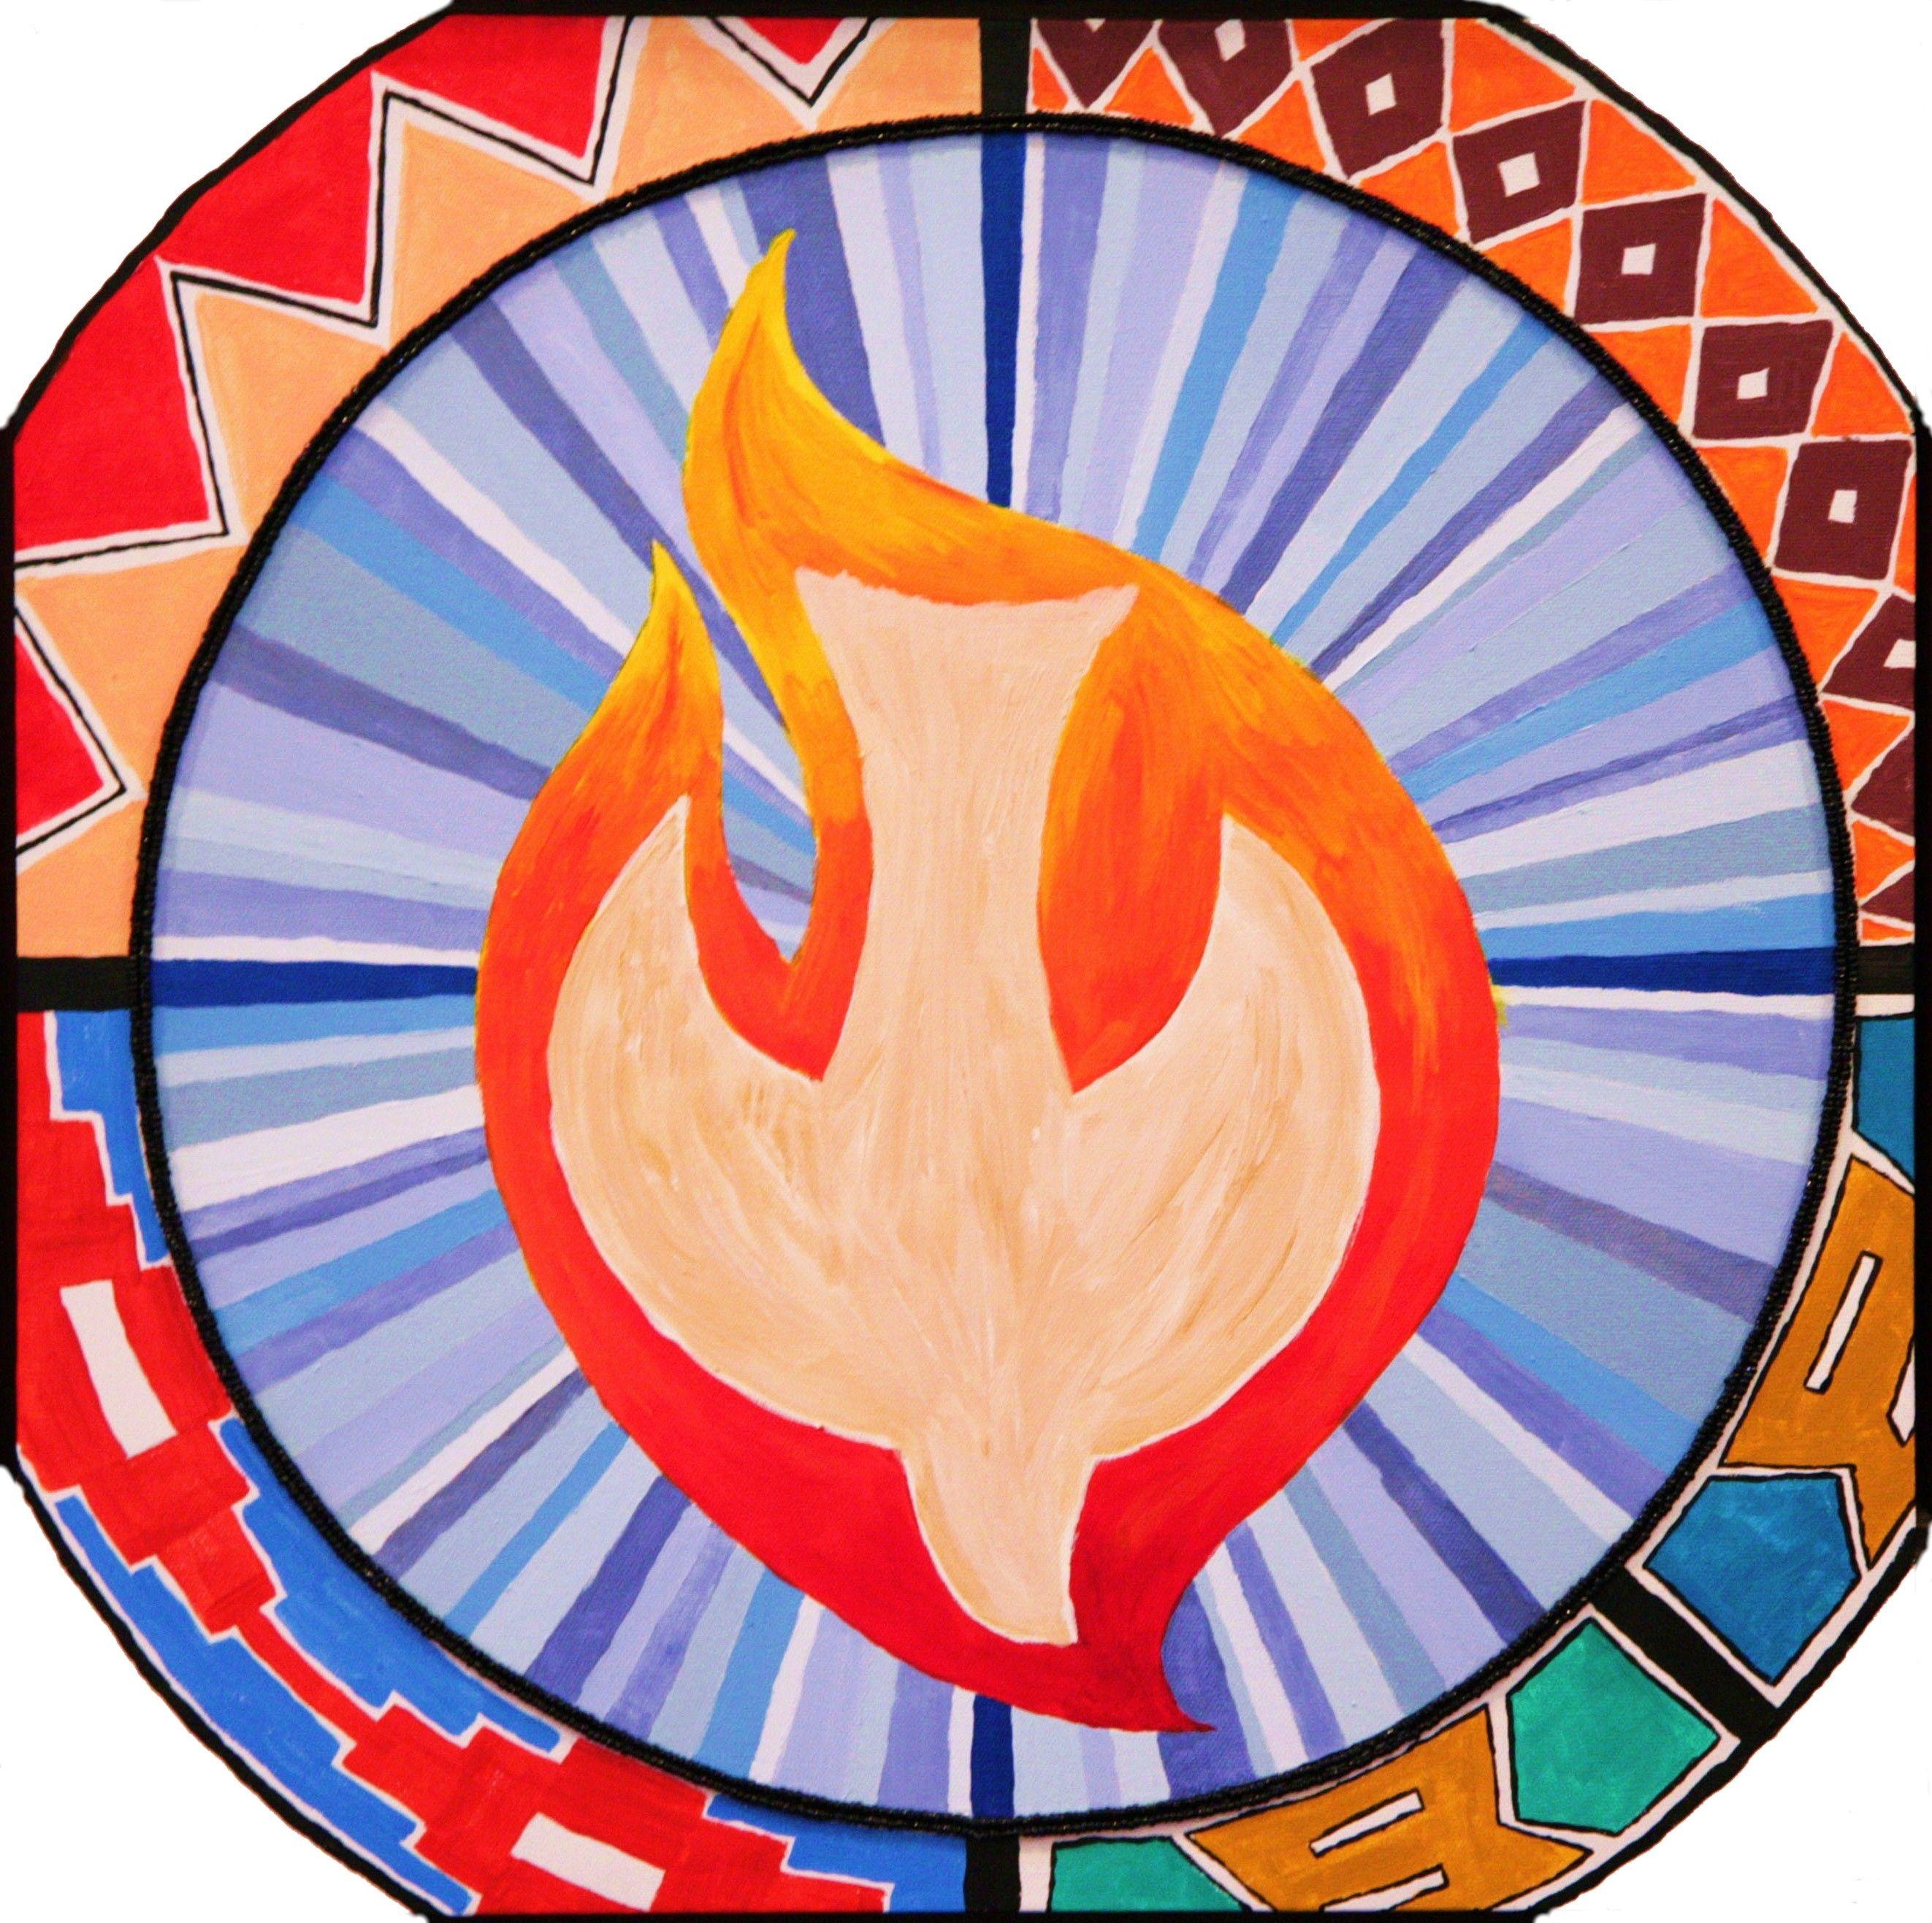 Pentecost Images